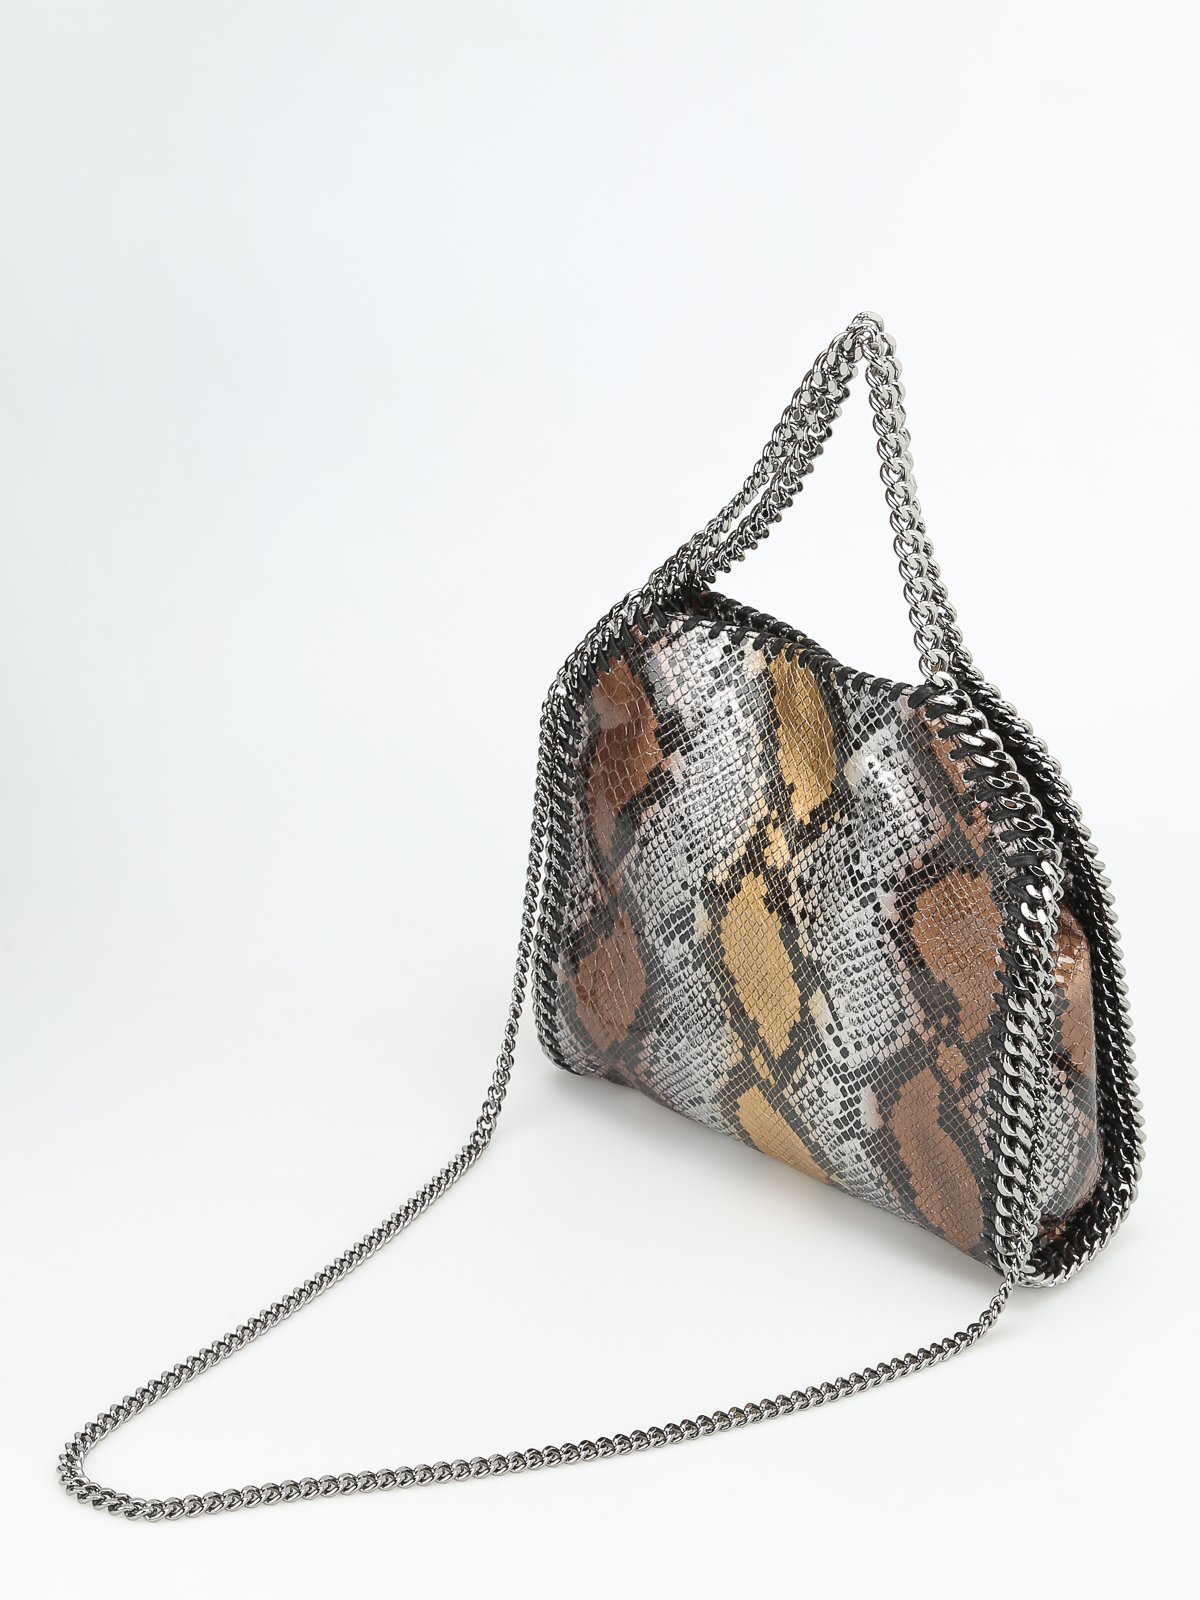 ea140ad2d7b7 iKRIX STELLA McCARTNEY  totes bags - Falabella fold over python bag